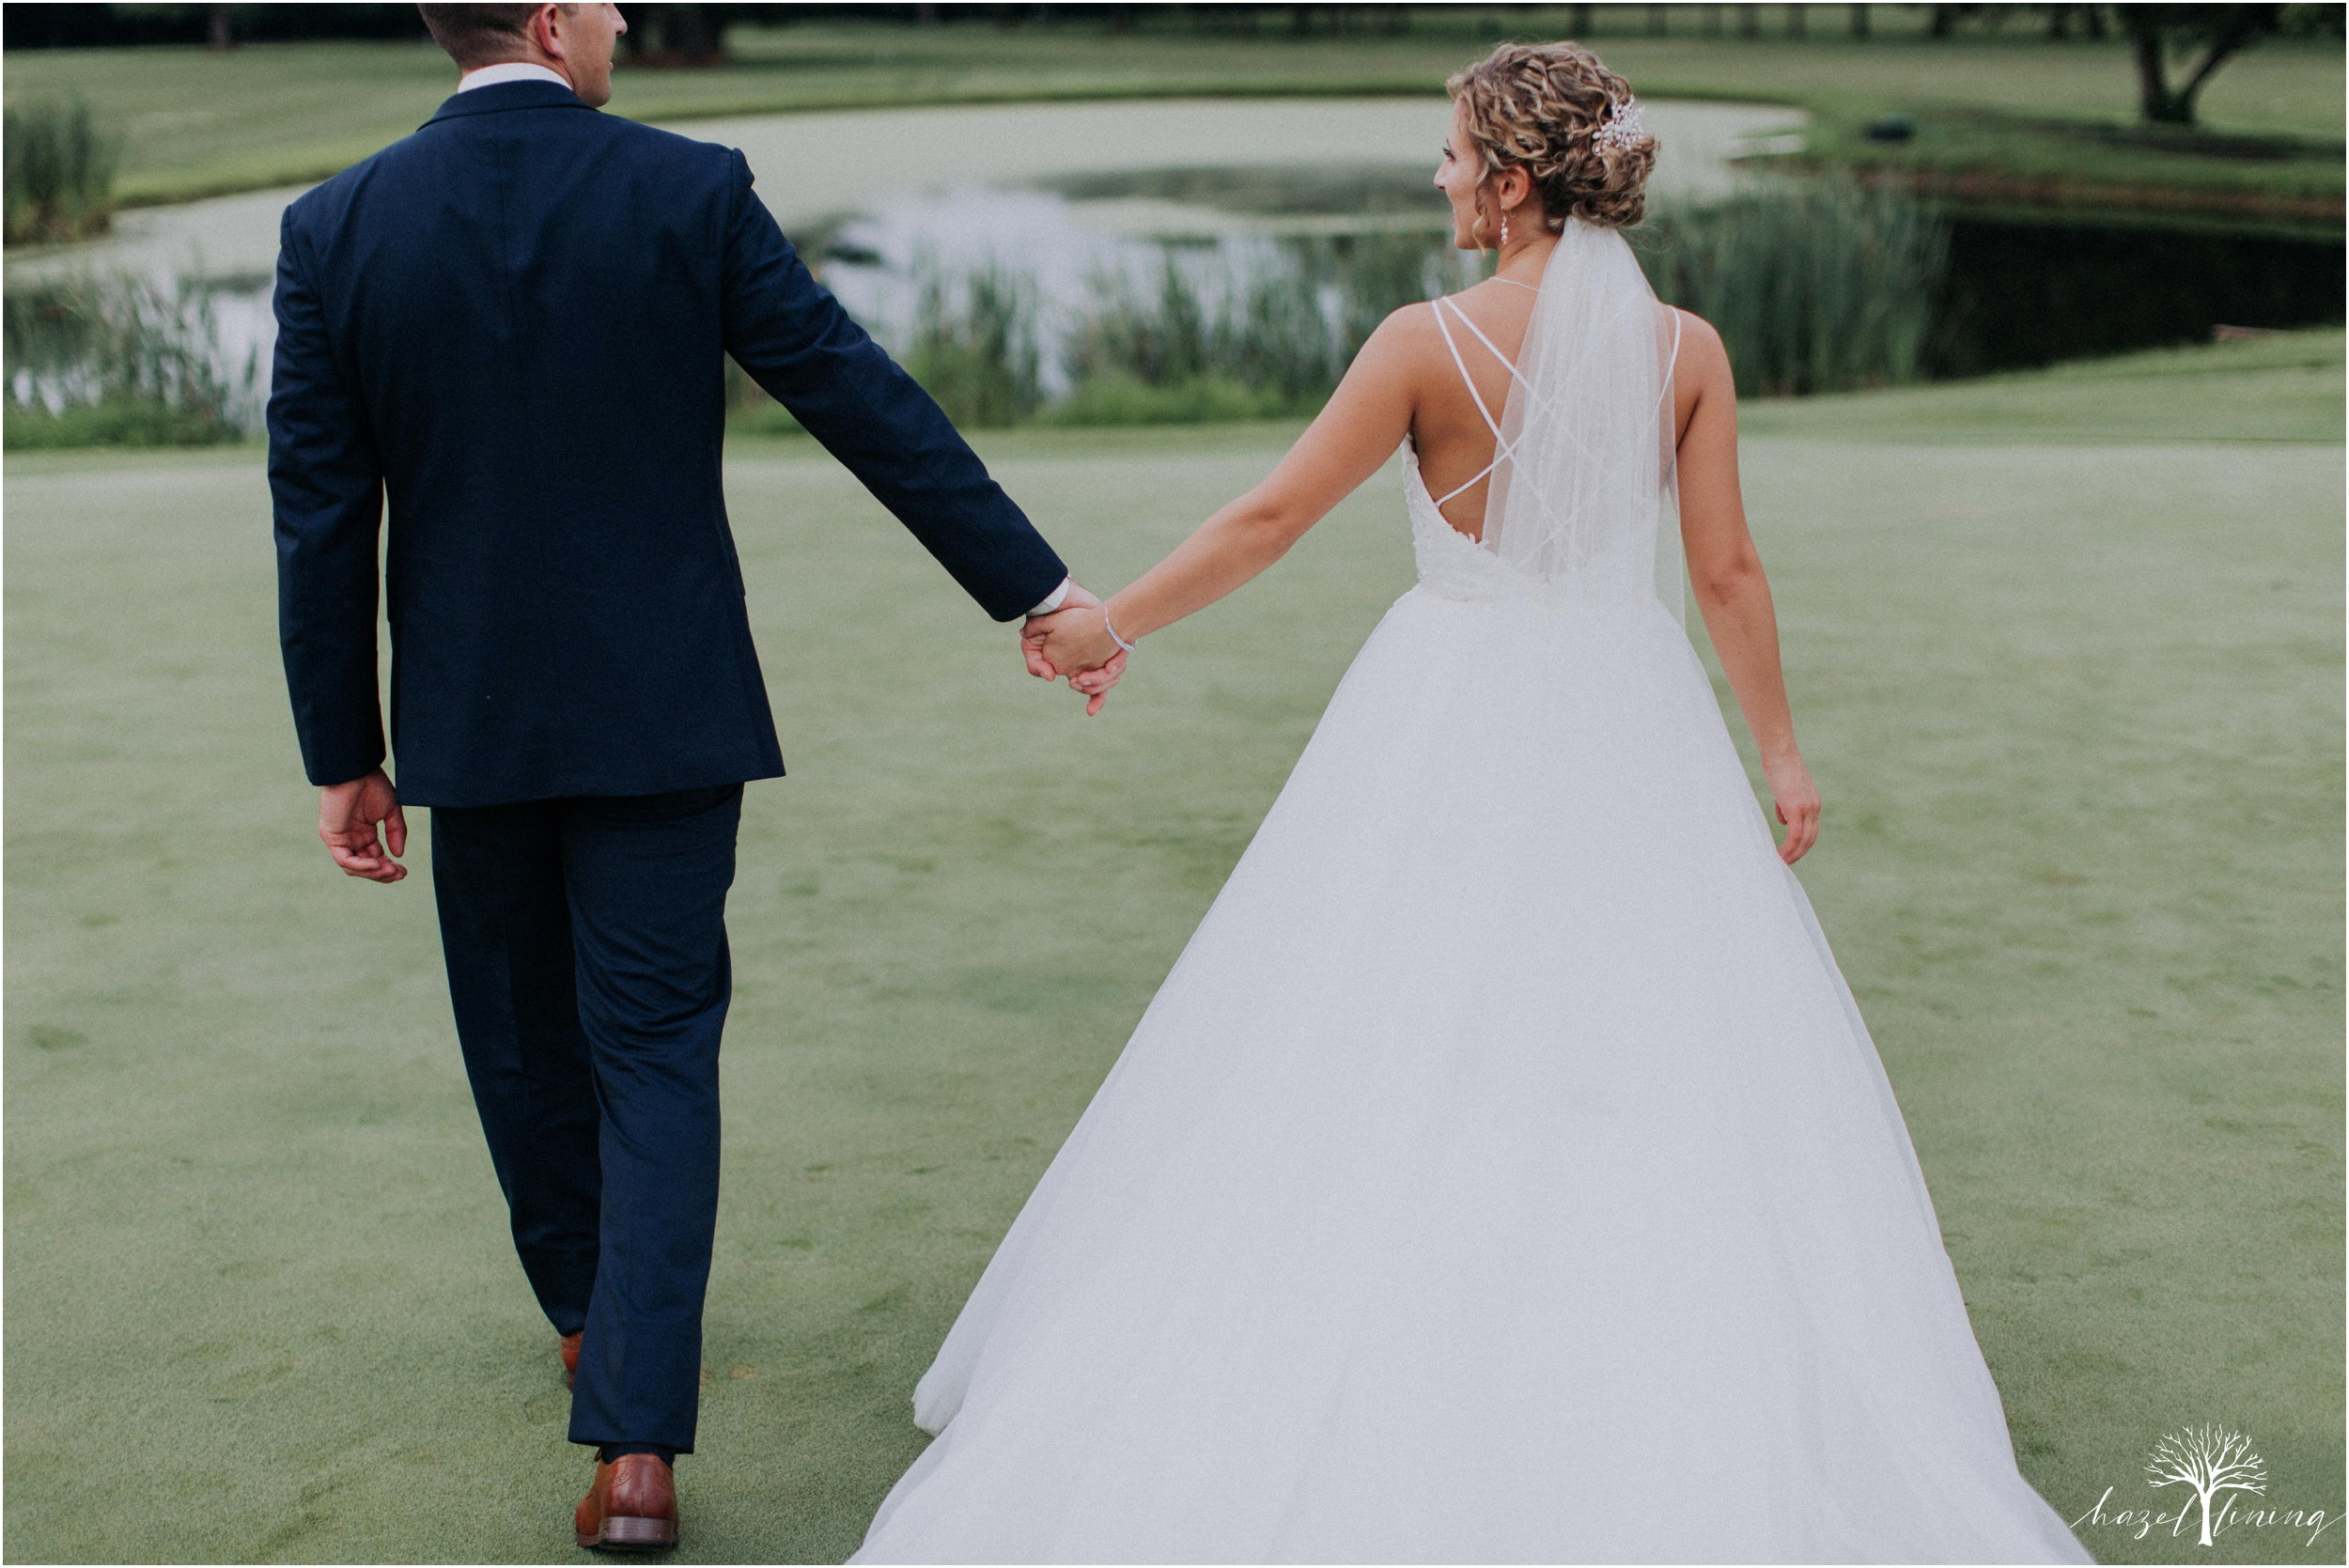 jonathan-weibel-becky-haywood-loft-at-sweetwater-cc-pennsburg-pennsylvania-rainy-day-summer-wedding-hazel-lining-travel-wedding-elopement-photography_0085.jpg